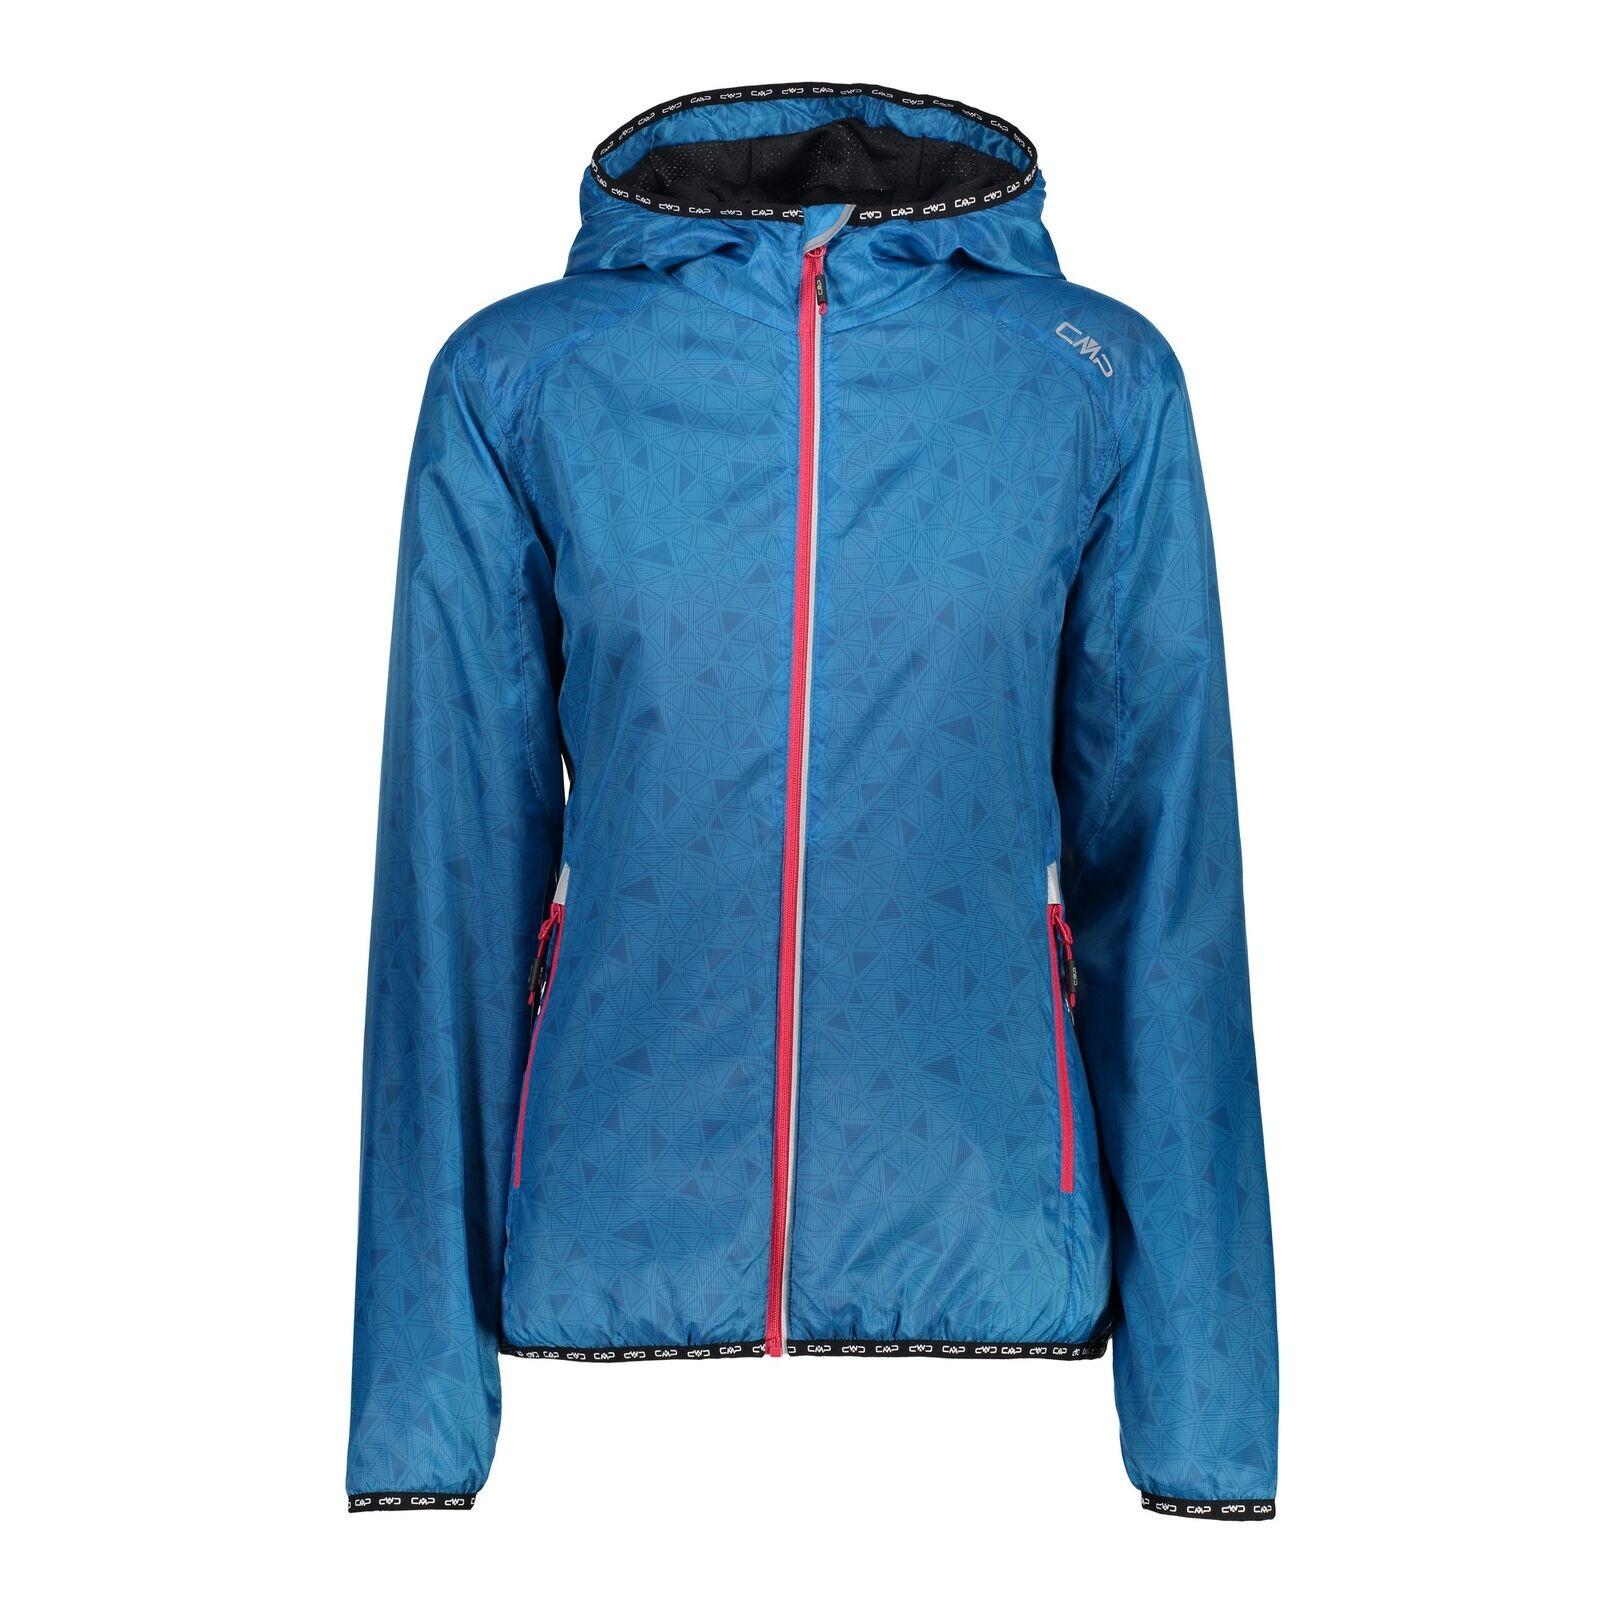 CMP Funktionsjacke Funktionsjacke Funktionsjacke Jacke WOMAN JACKET WARM UP blau winddicht leicht 97d111